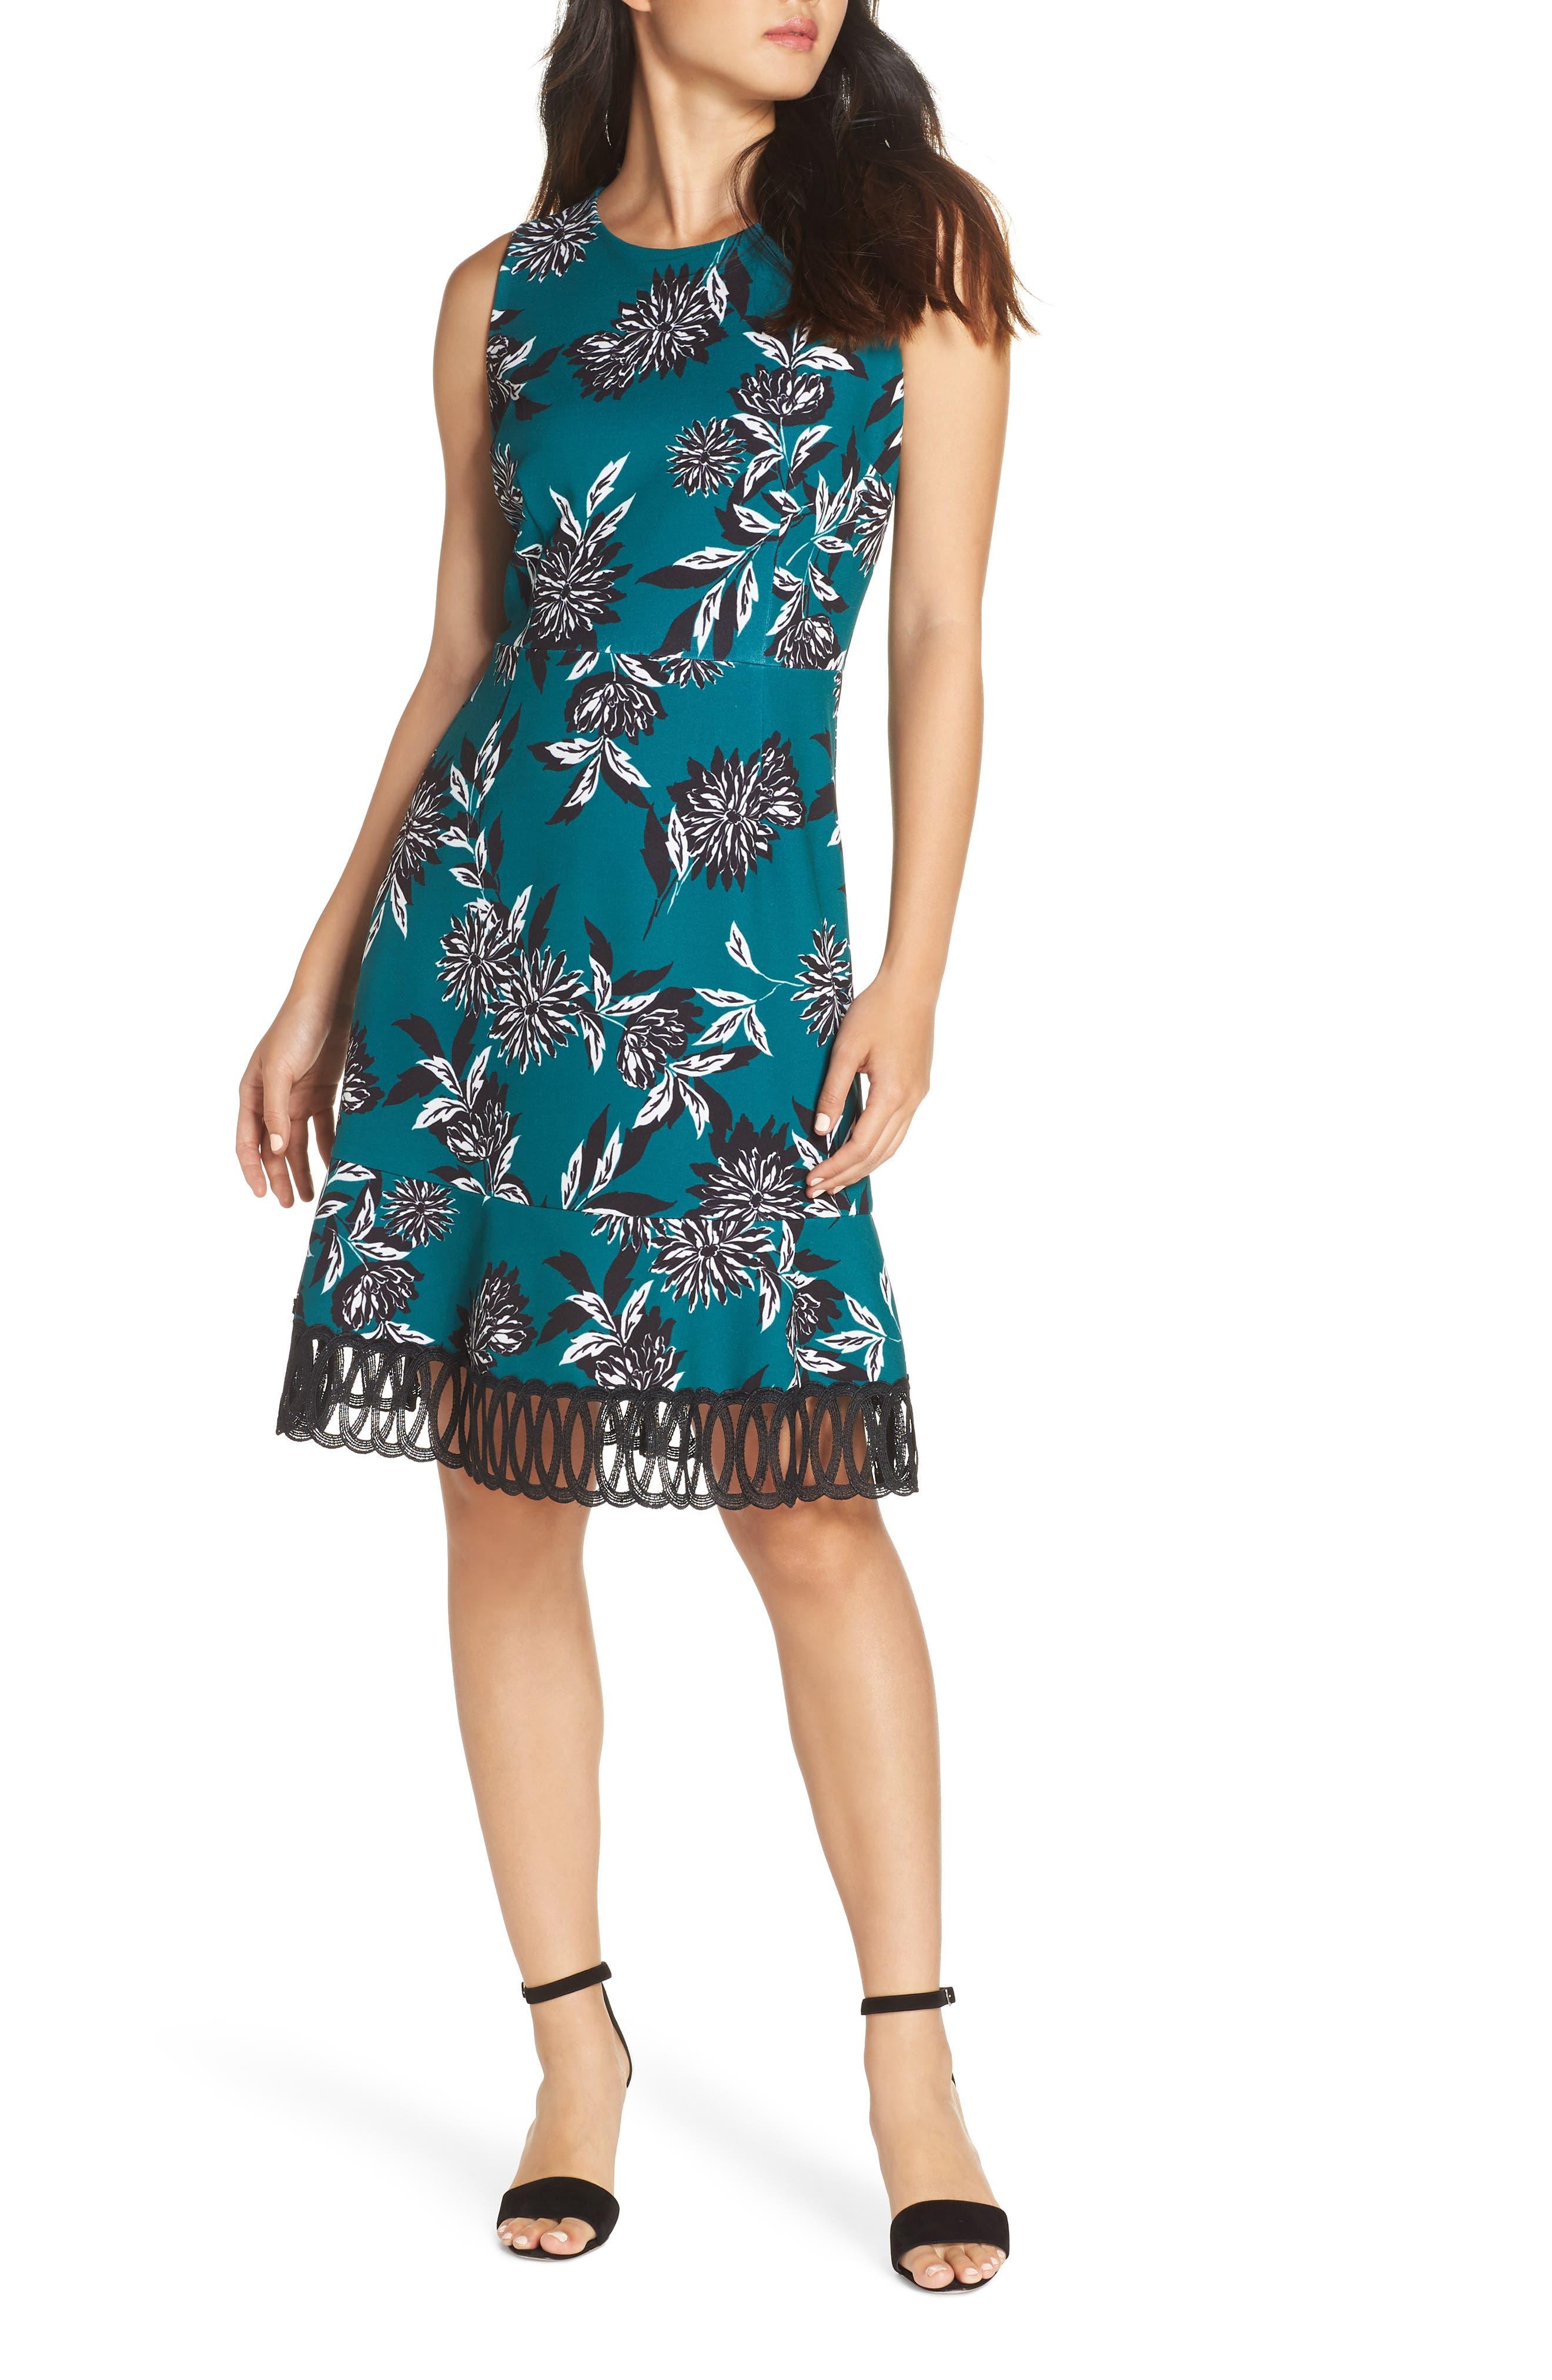 JULIA JORDAN, Crepe Scuba A-Line Dress, Main thumbnail 1, color, 300